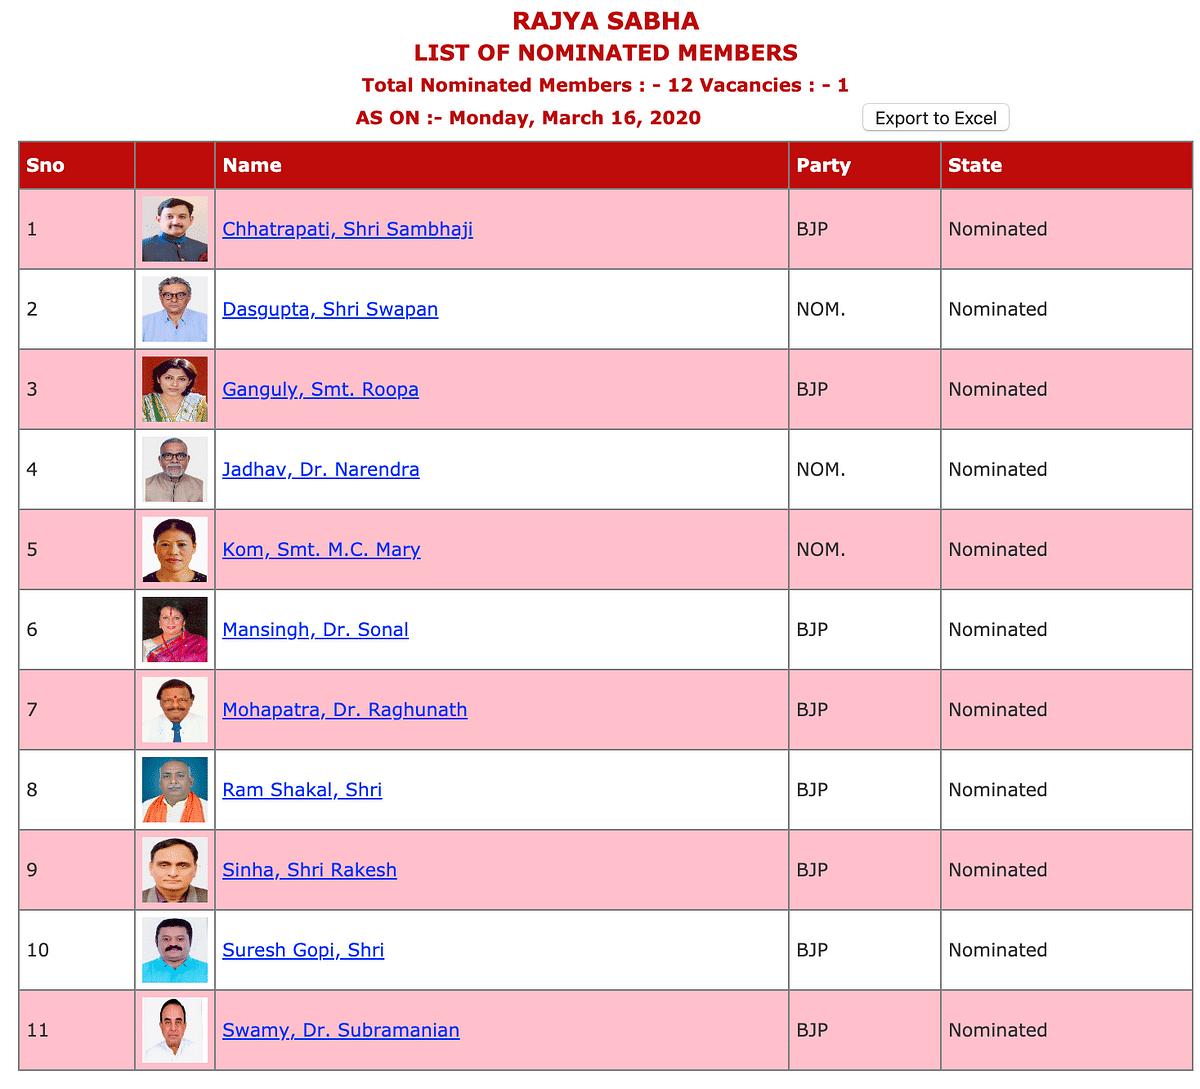 Nominated Members of Rajya Sabha as on March 16, 2020